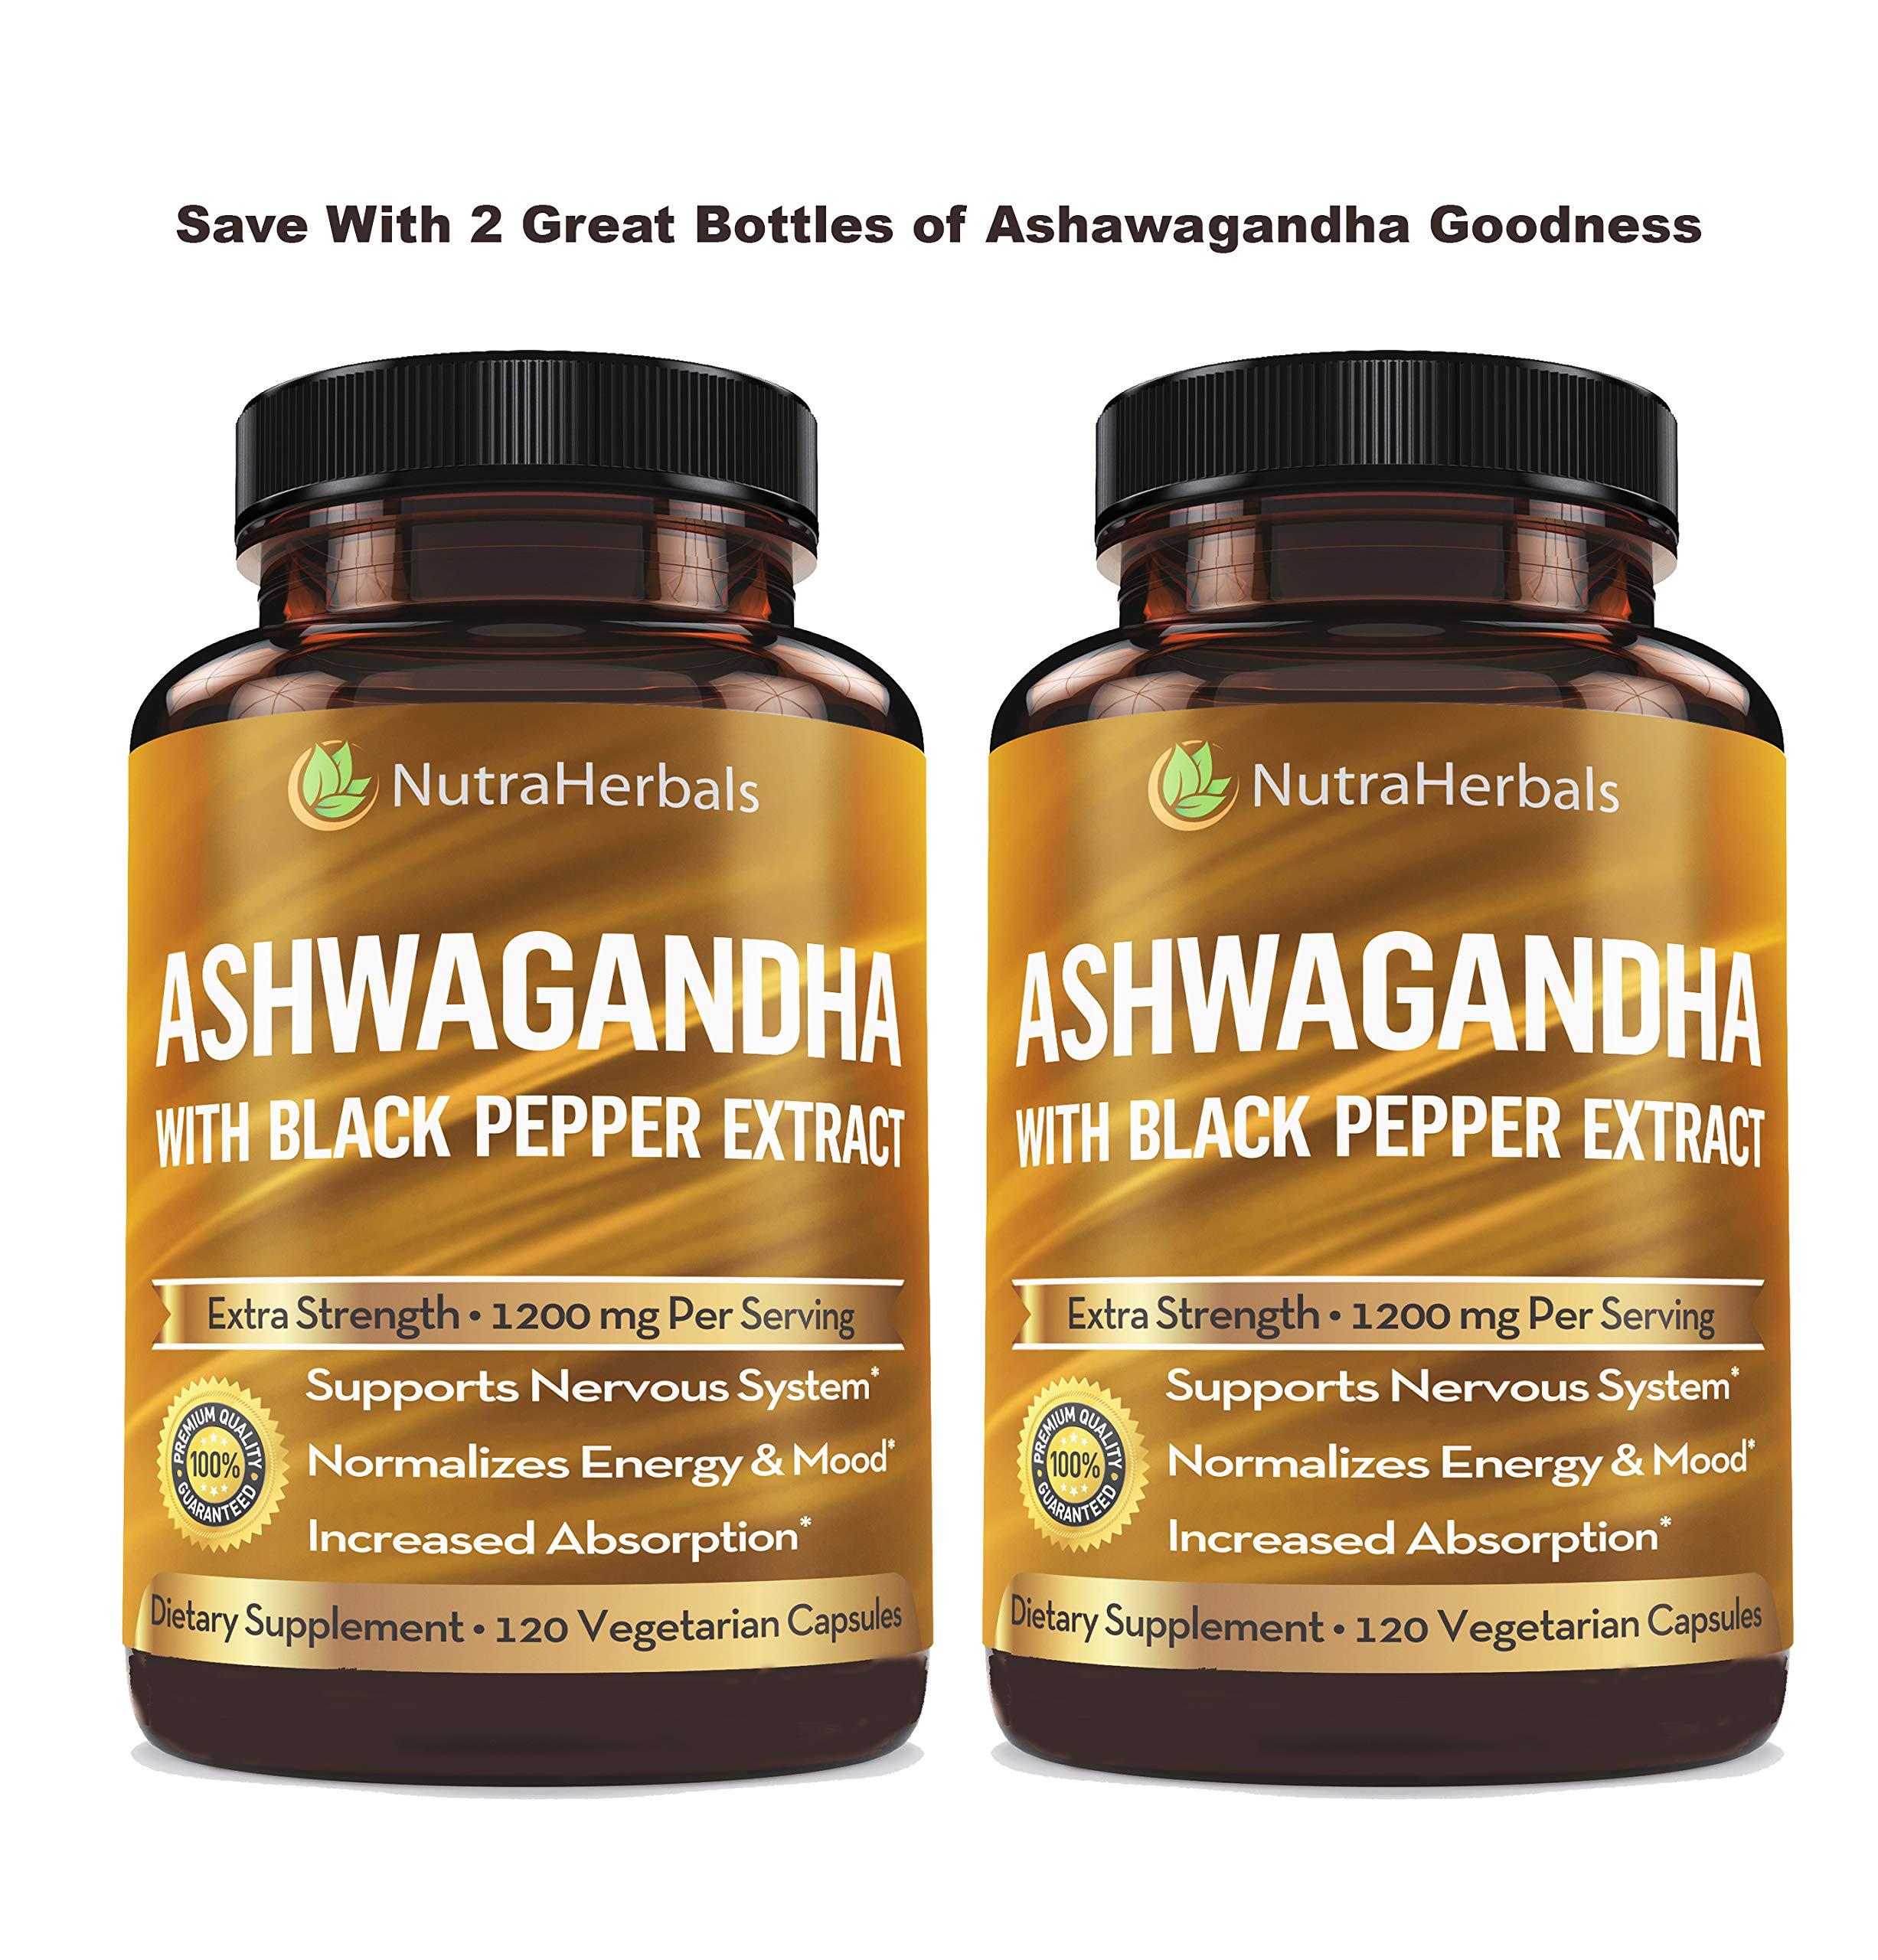 Organic Ashwagandha Root Powder 1200mg - 120 Veggie Capsules - Ashwaganda Supplement - Black Pepper Extract for Increased Absorption by NUTRAHERBALS